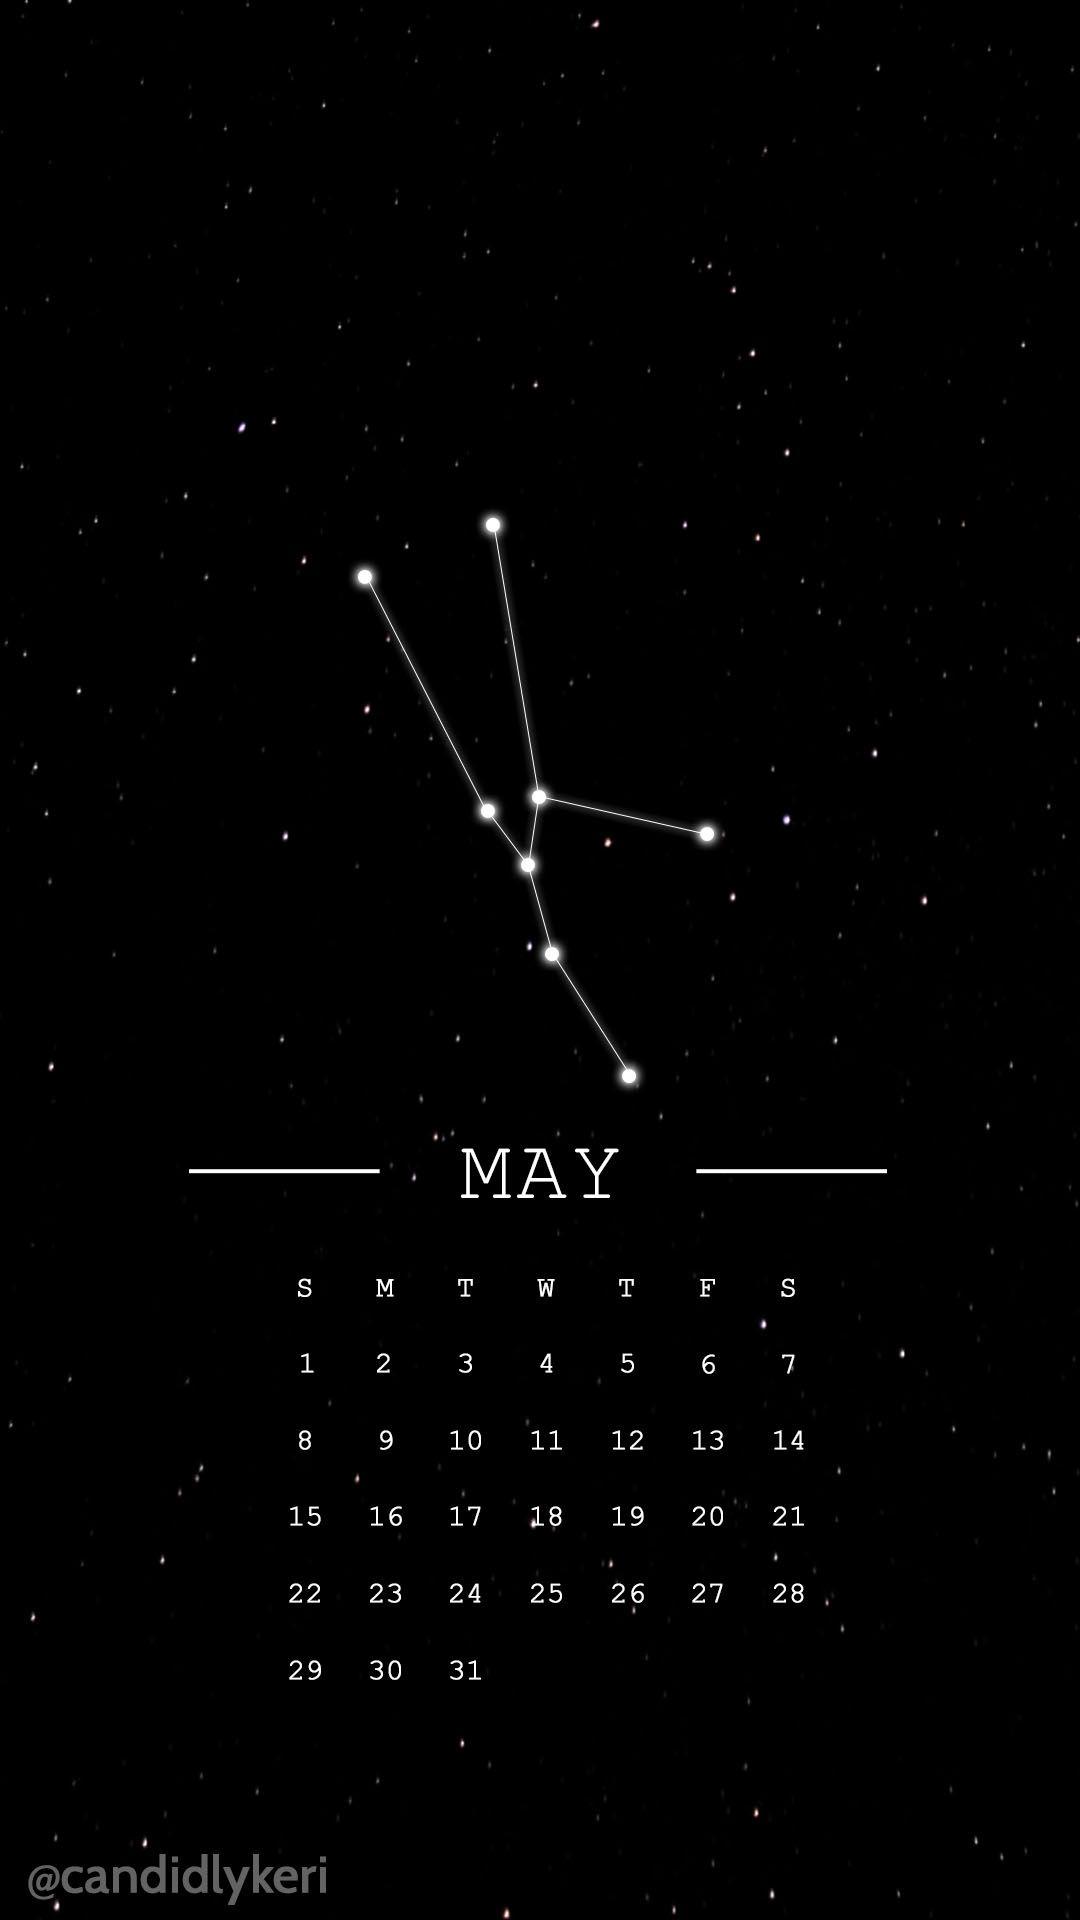 Taurus Constellation Horoscope May 2016 Calendar Wallpaper